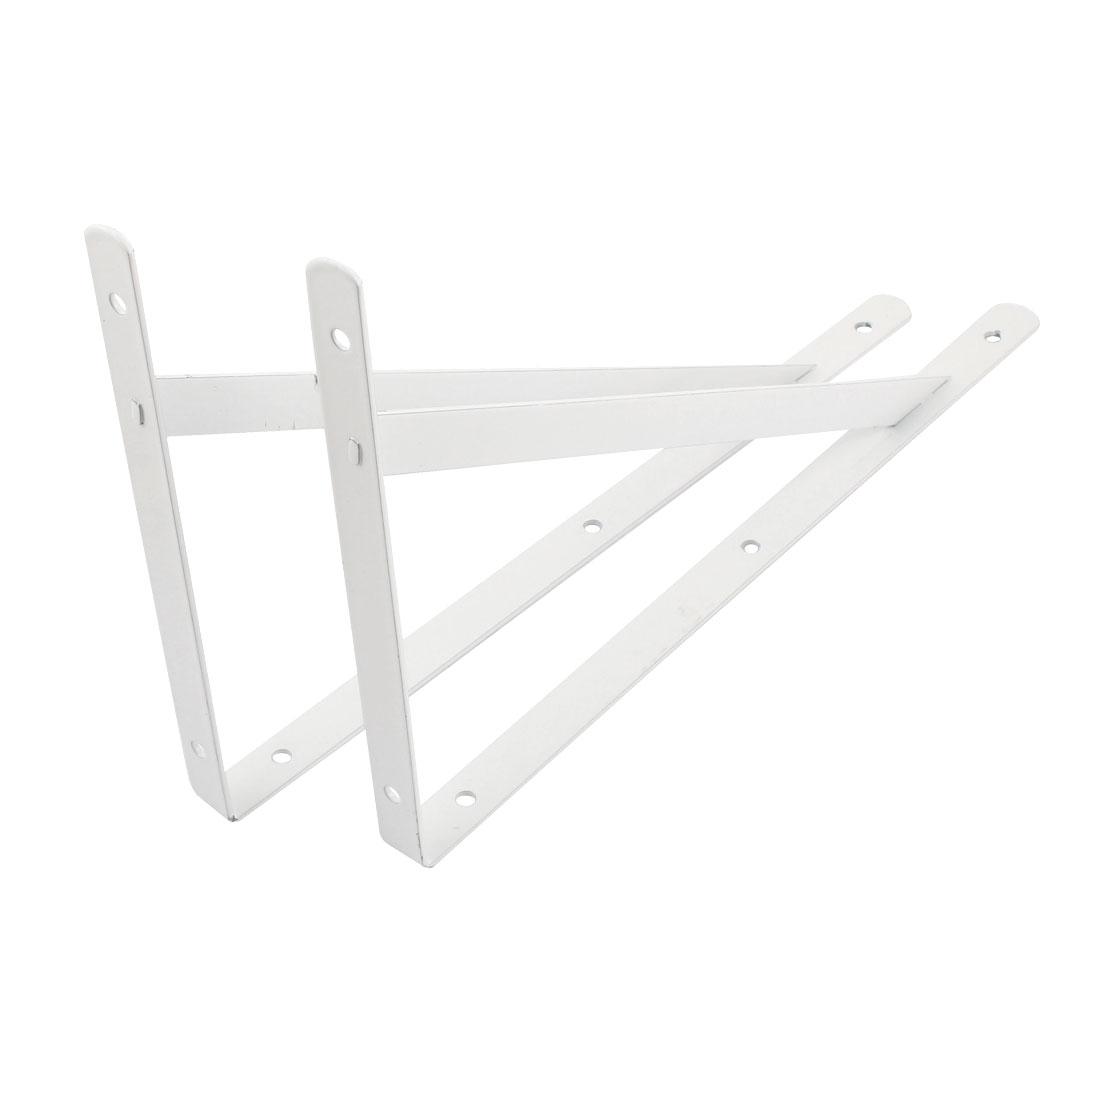 2 Pcs Triangle Wall Mount Support Shelf Bracket Frame 300mm x 190mm